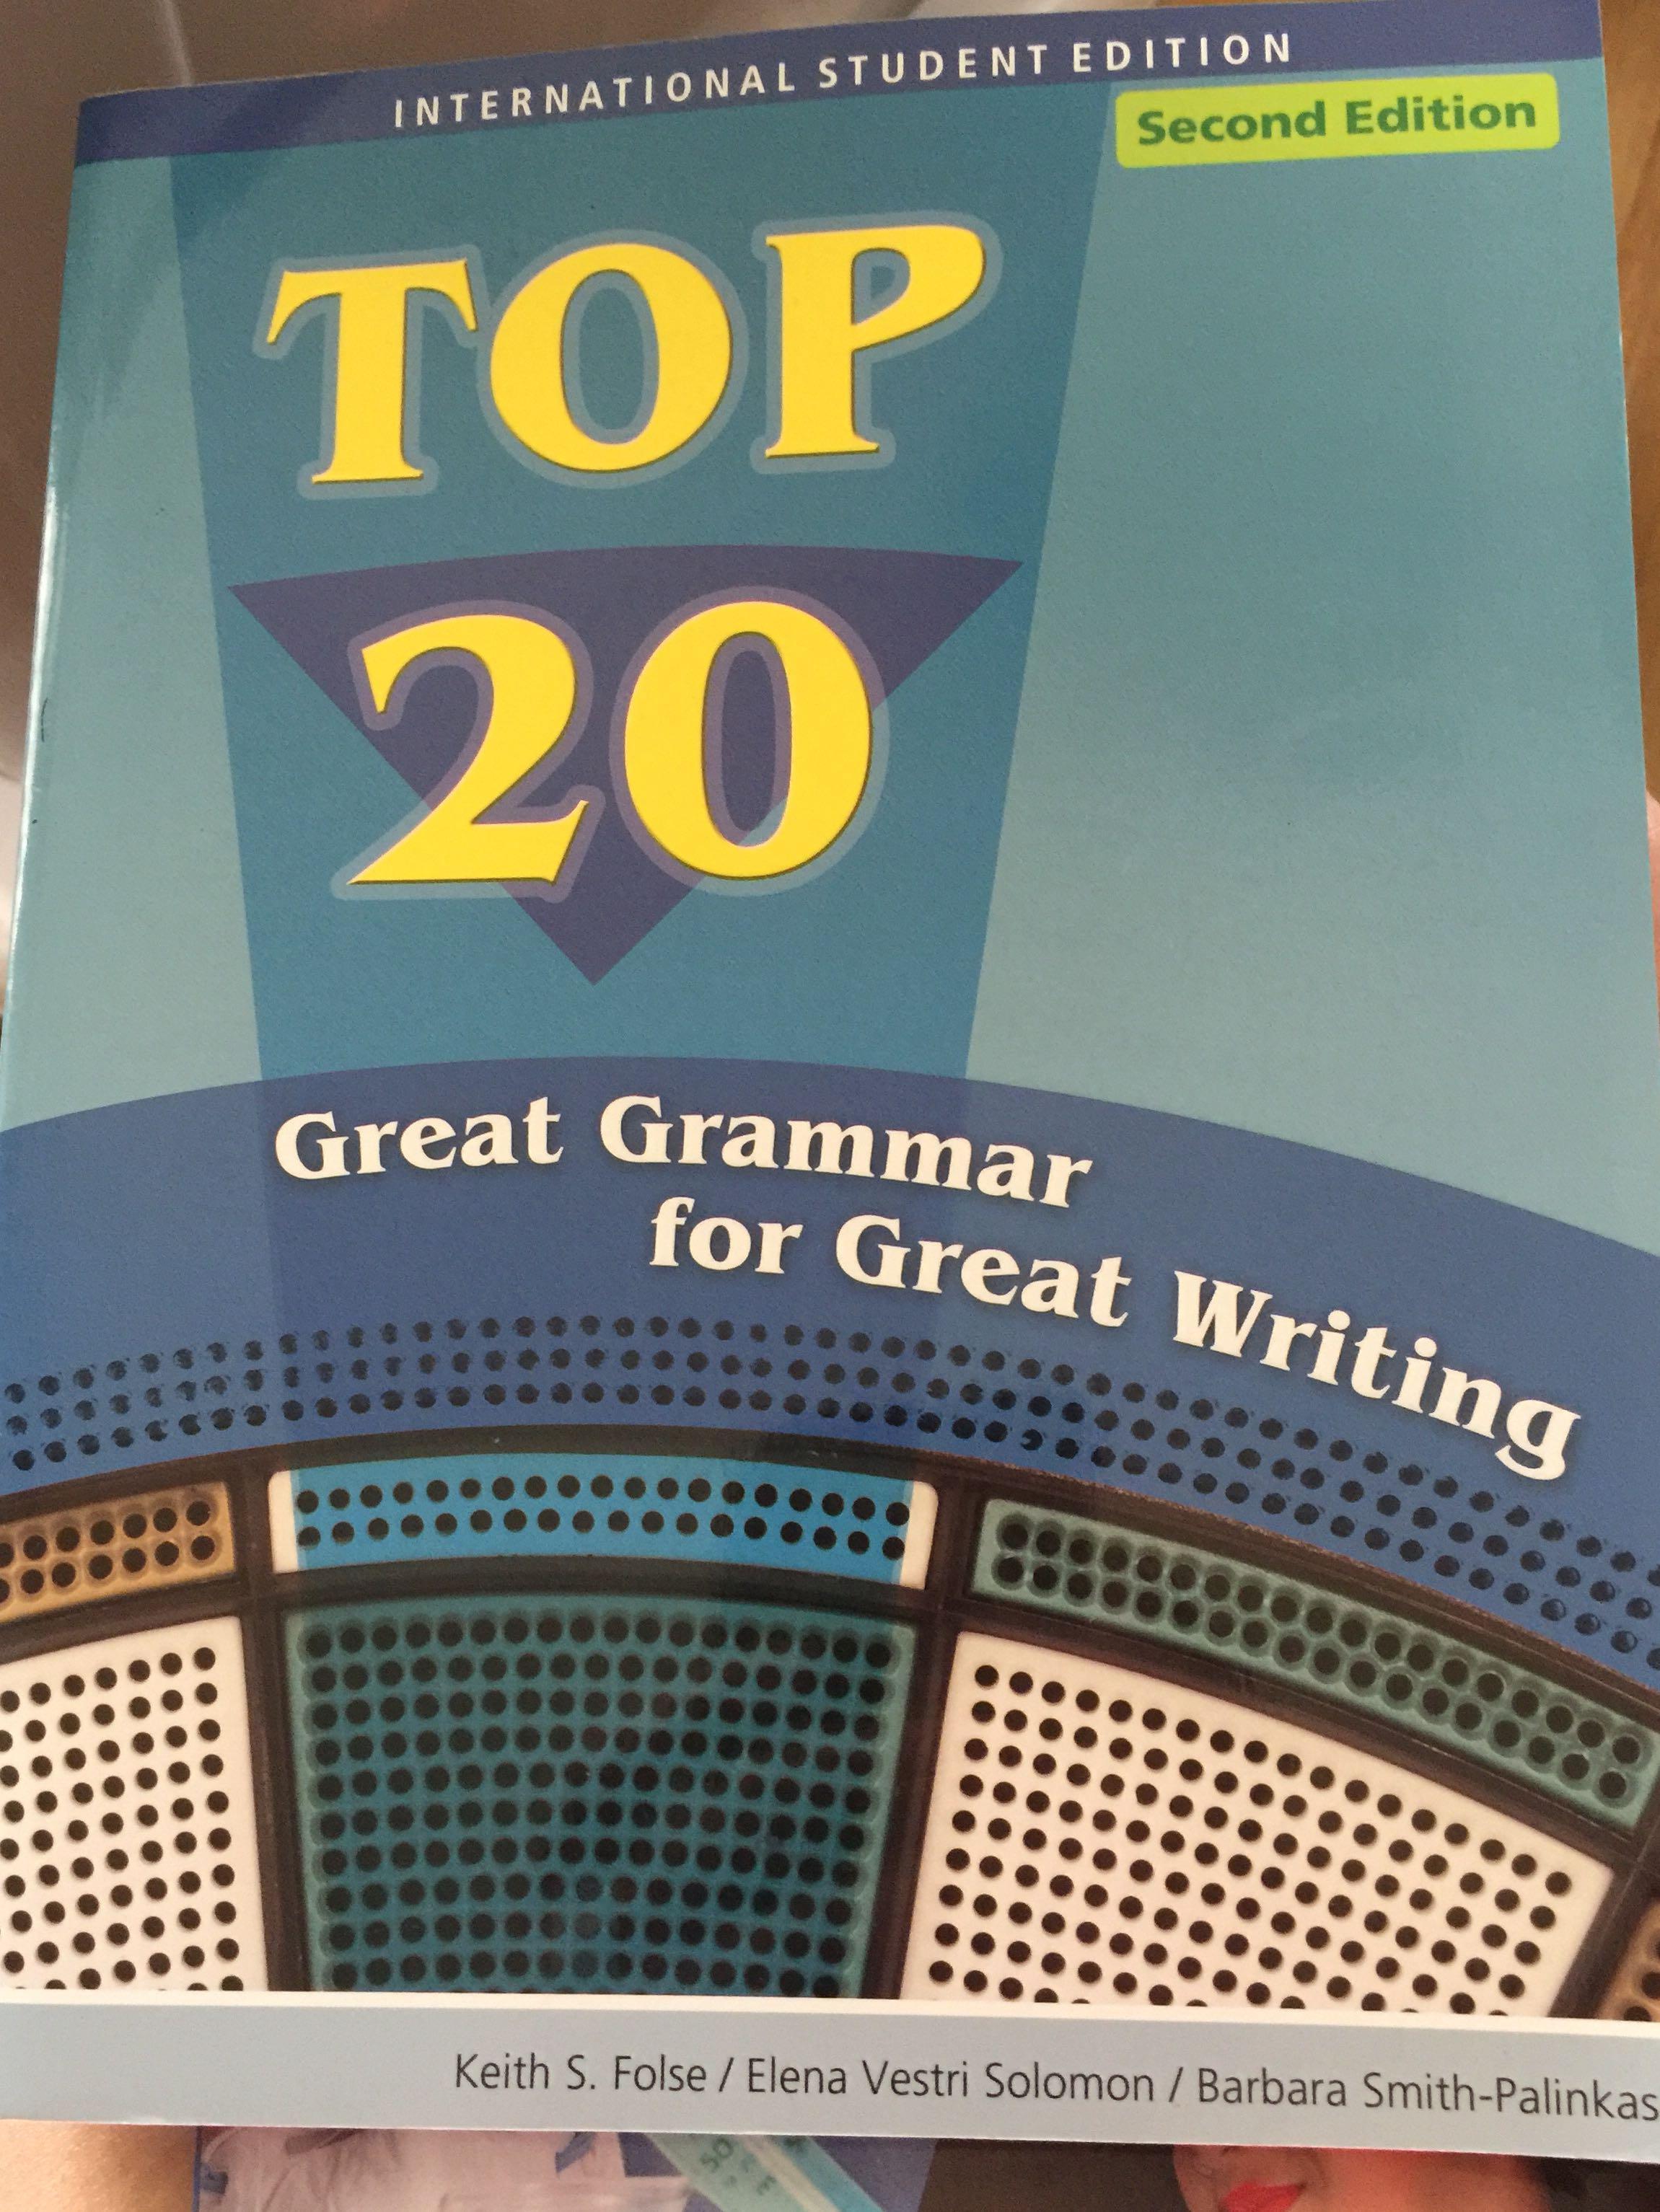 Grammars & writing